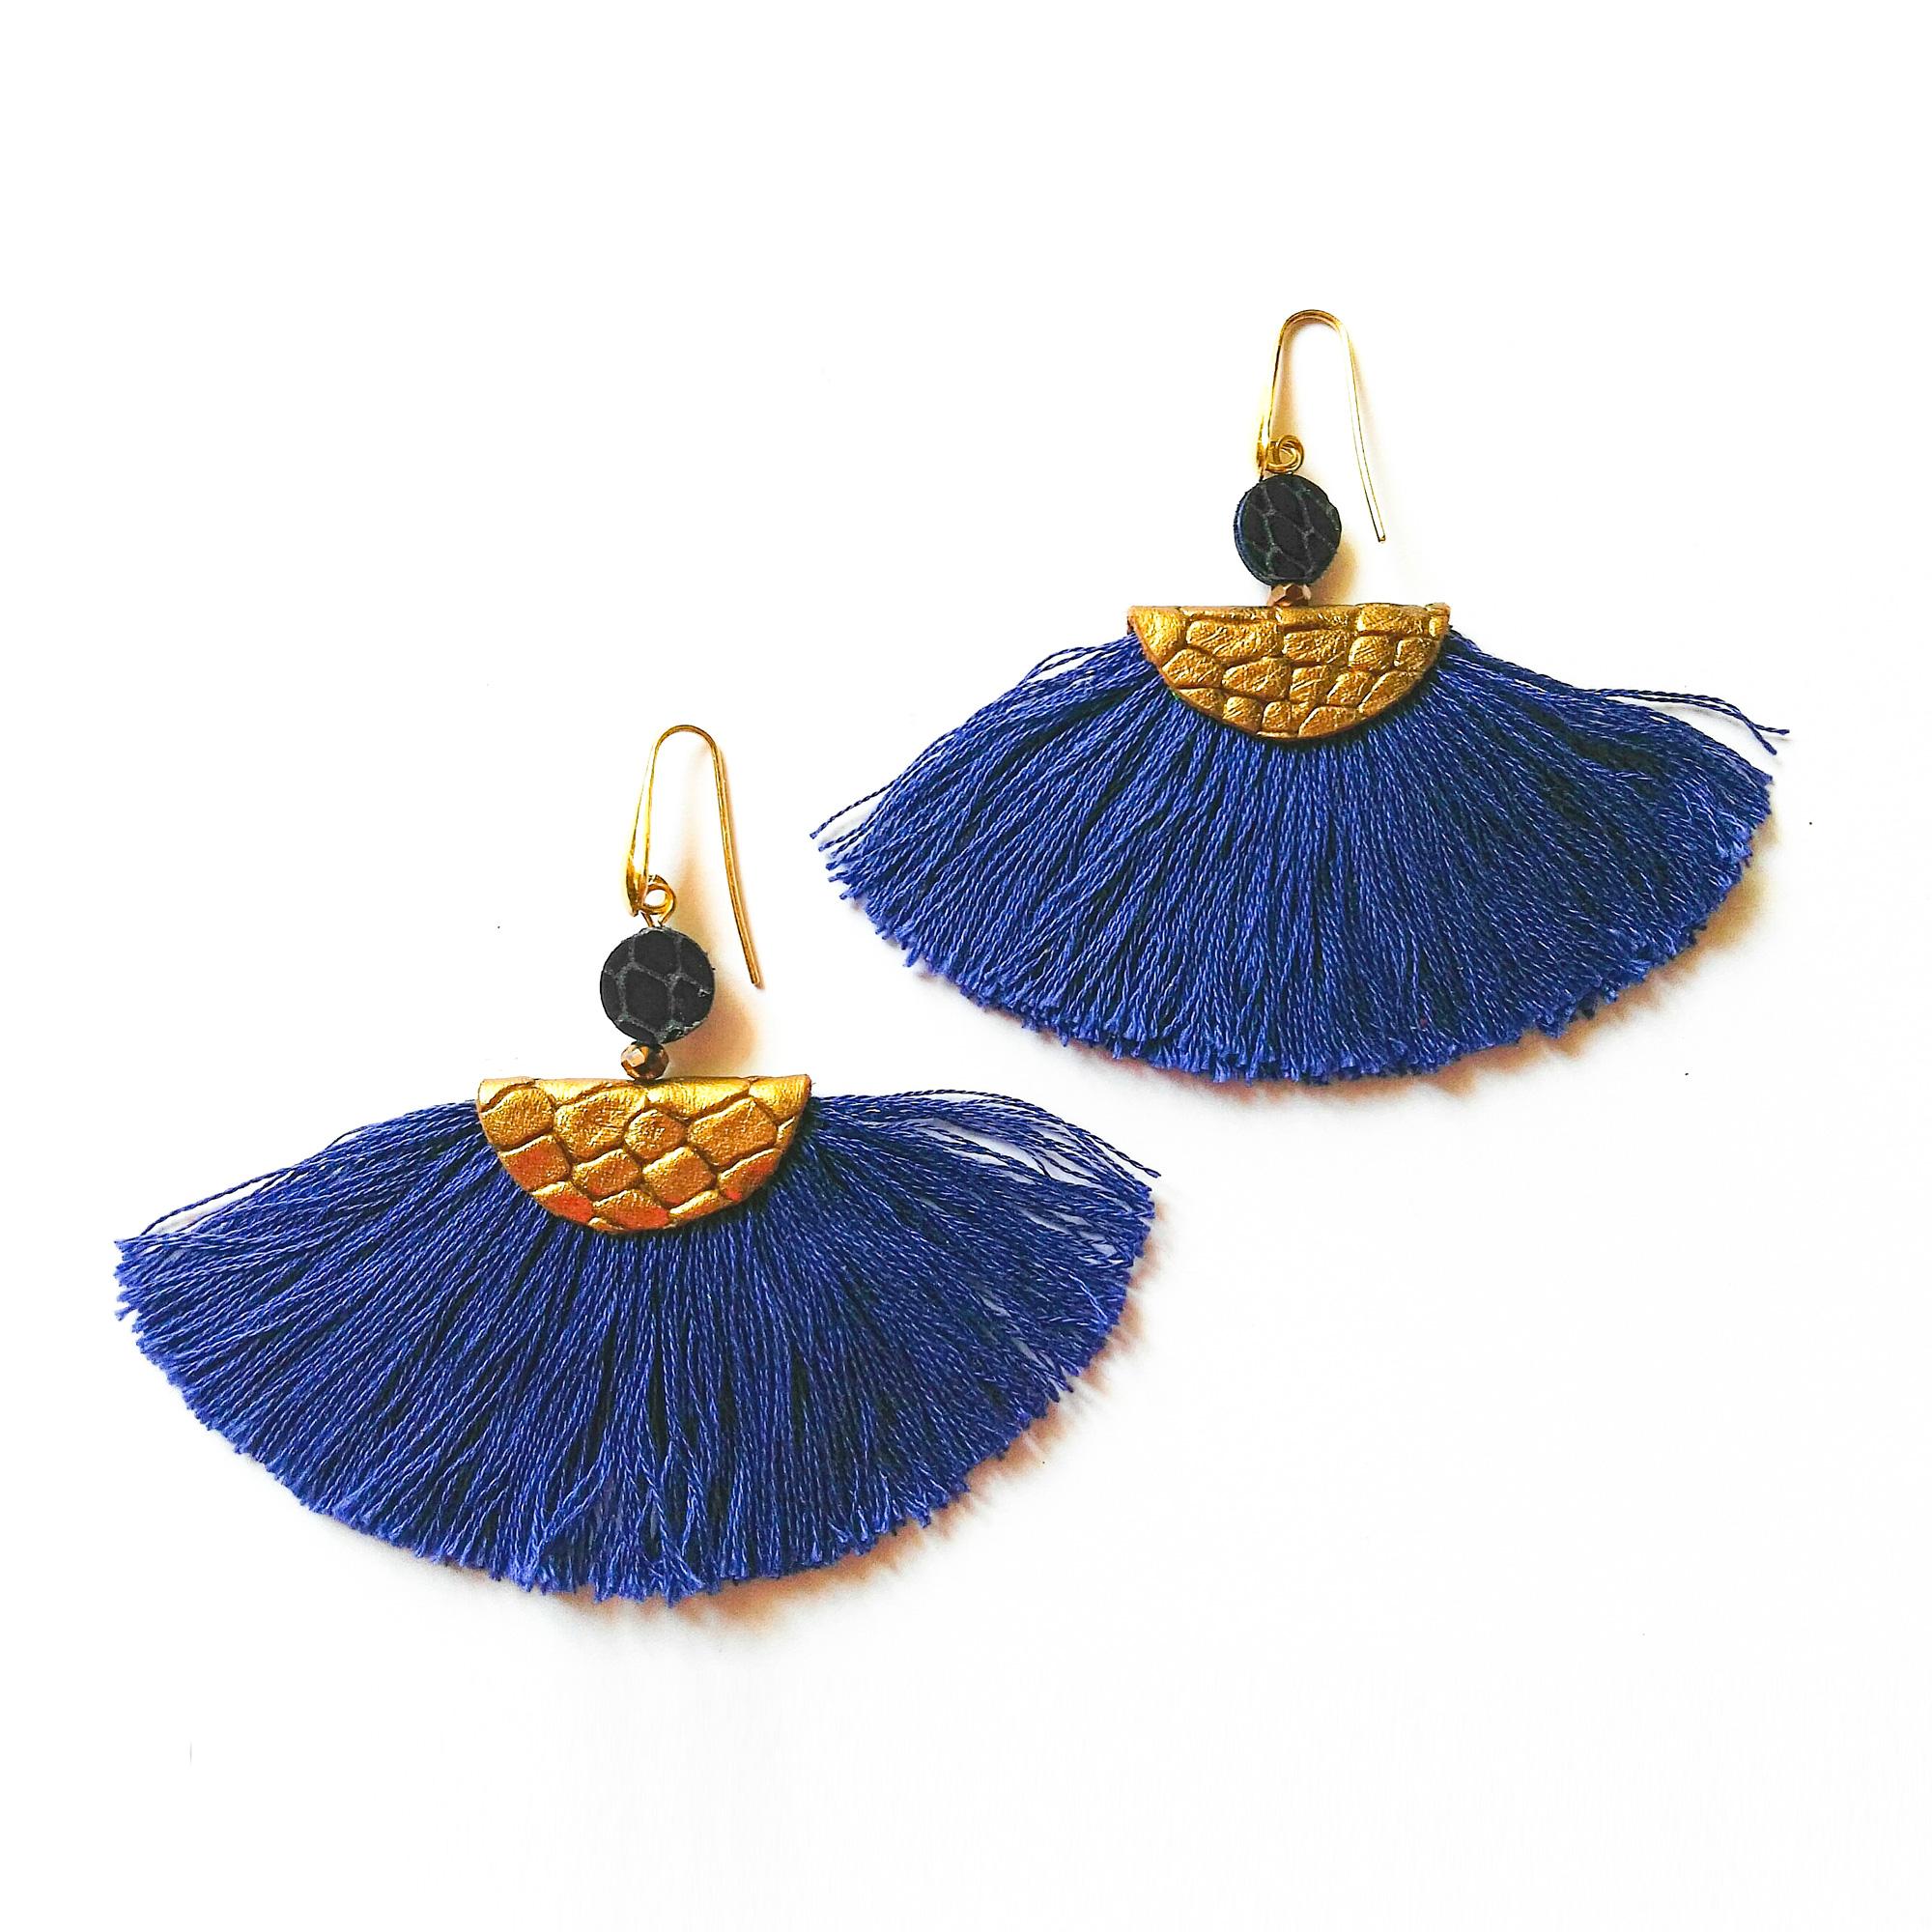 Popolare orecchini frange cotone | Xingu Blu | bluepointfirenze.it AS61